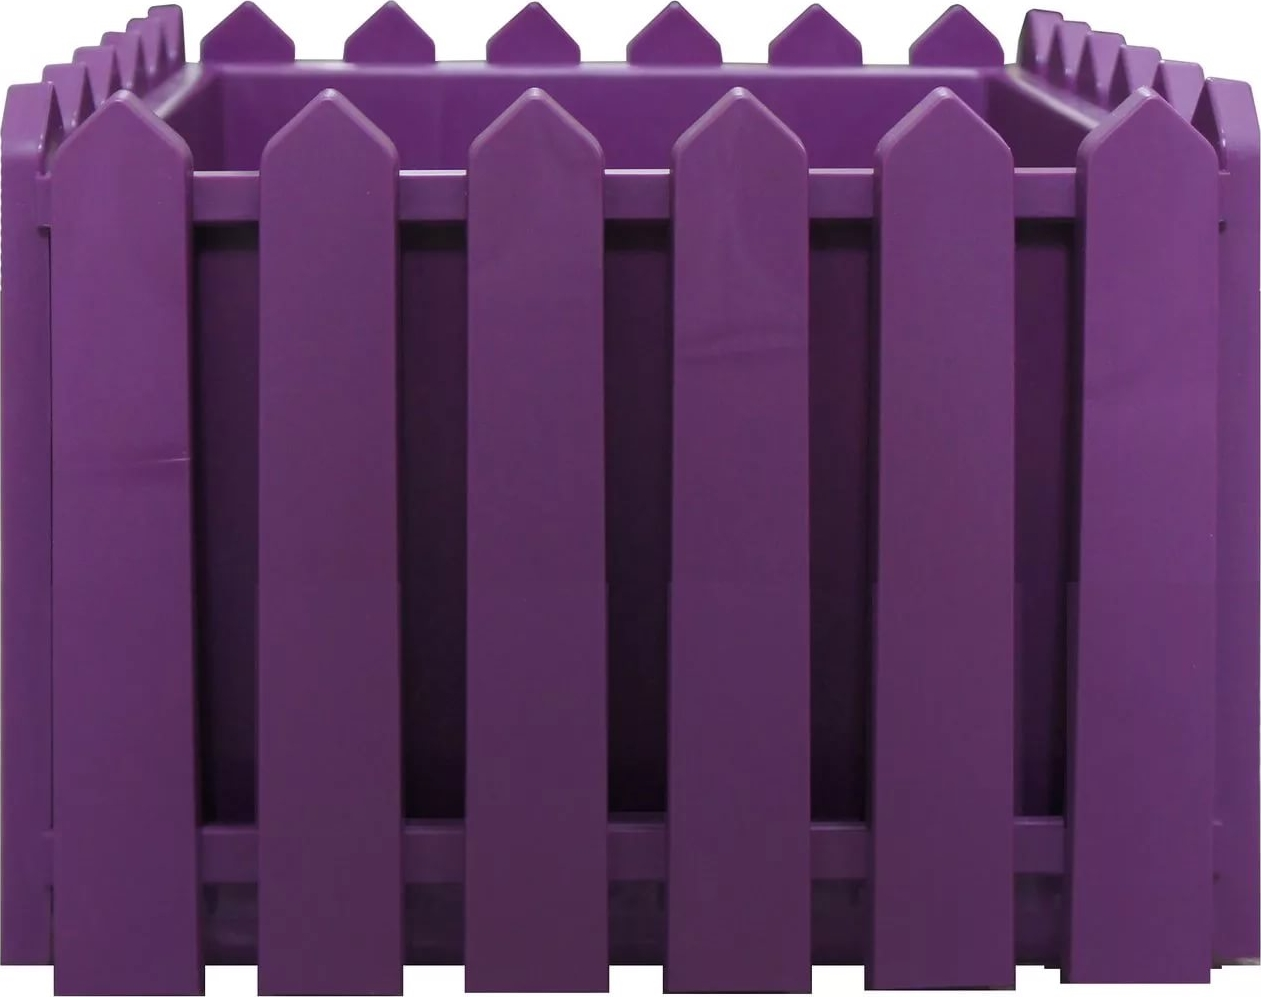 Кашпо Элластик-Пласт Лардо, ЭП 205814, лиловый, 28 х 28 х 22 см цена